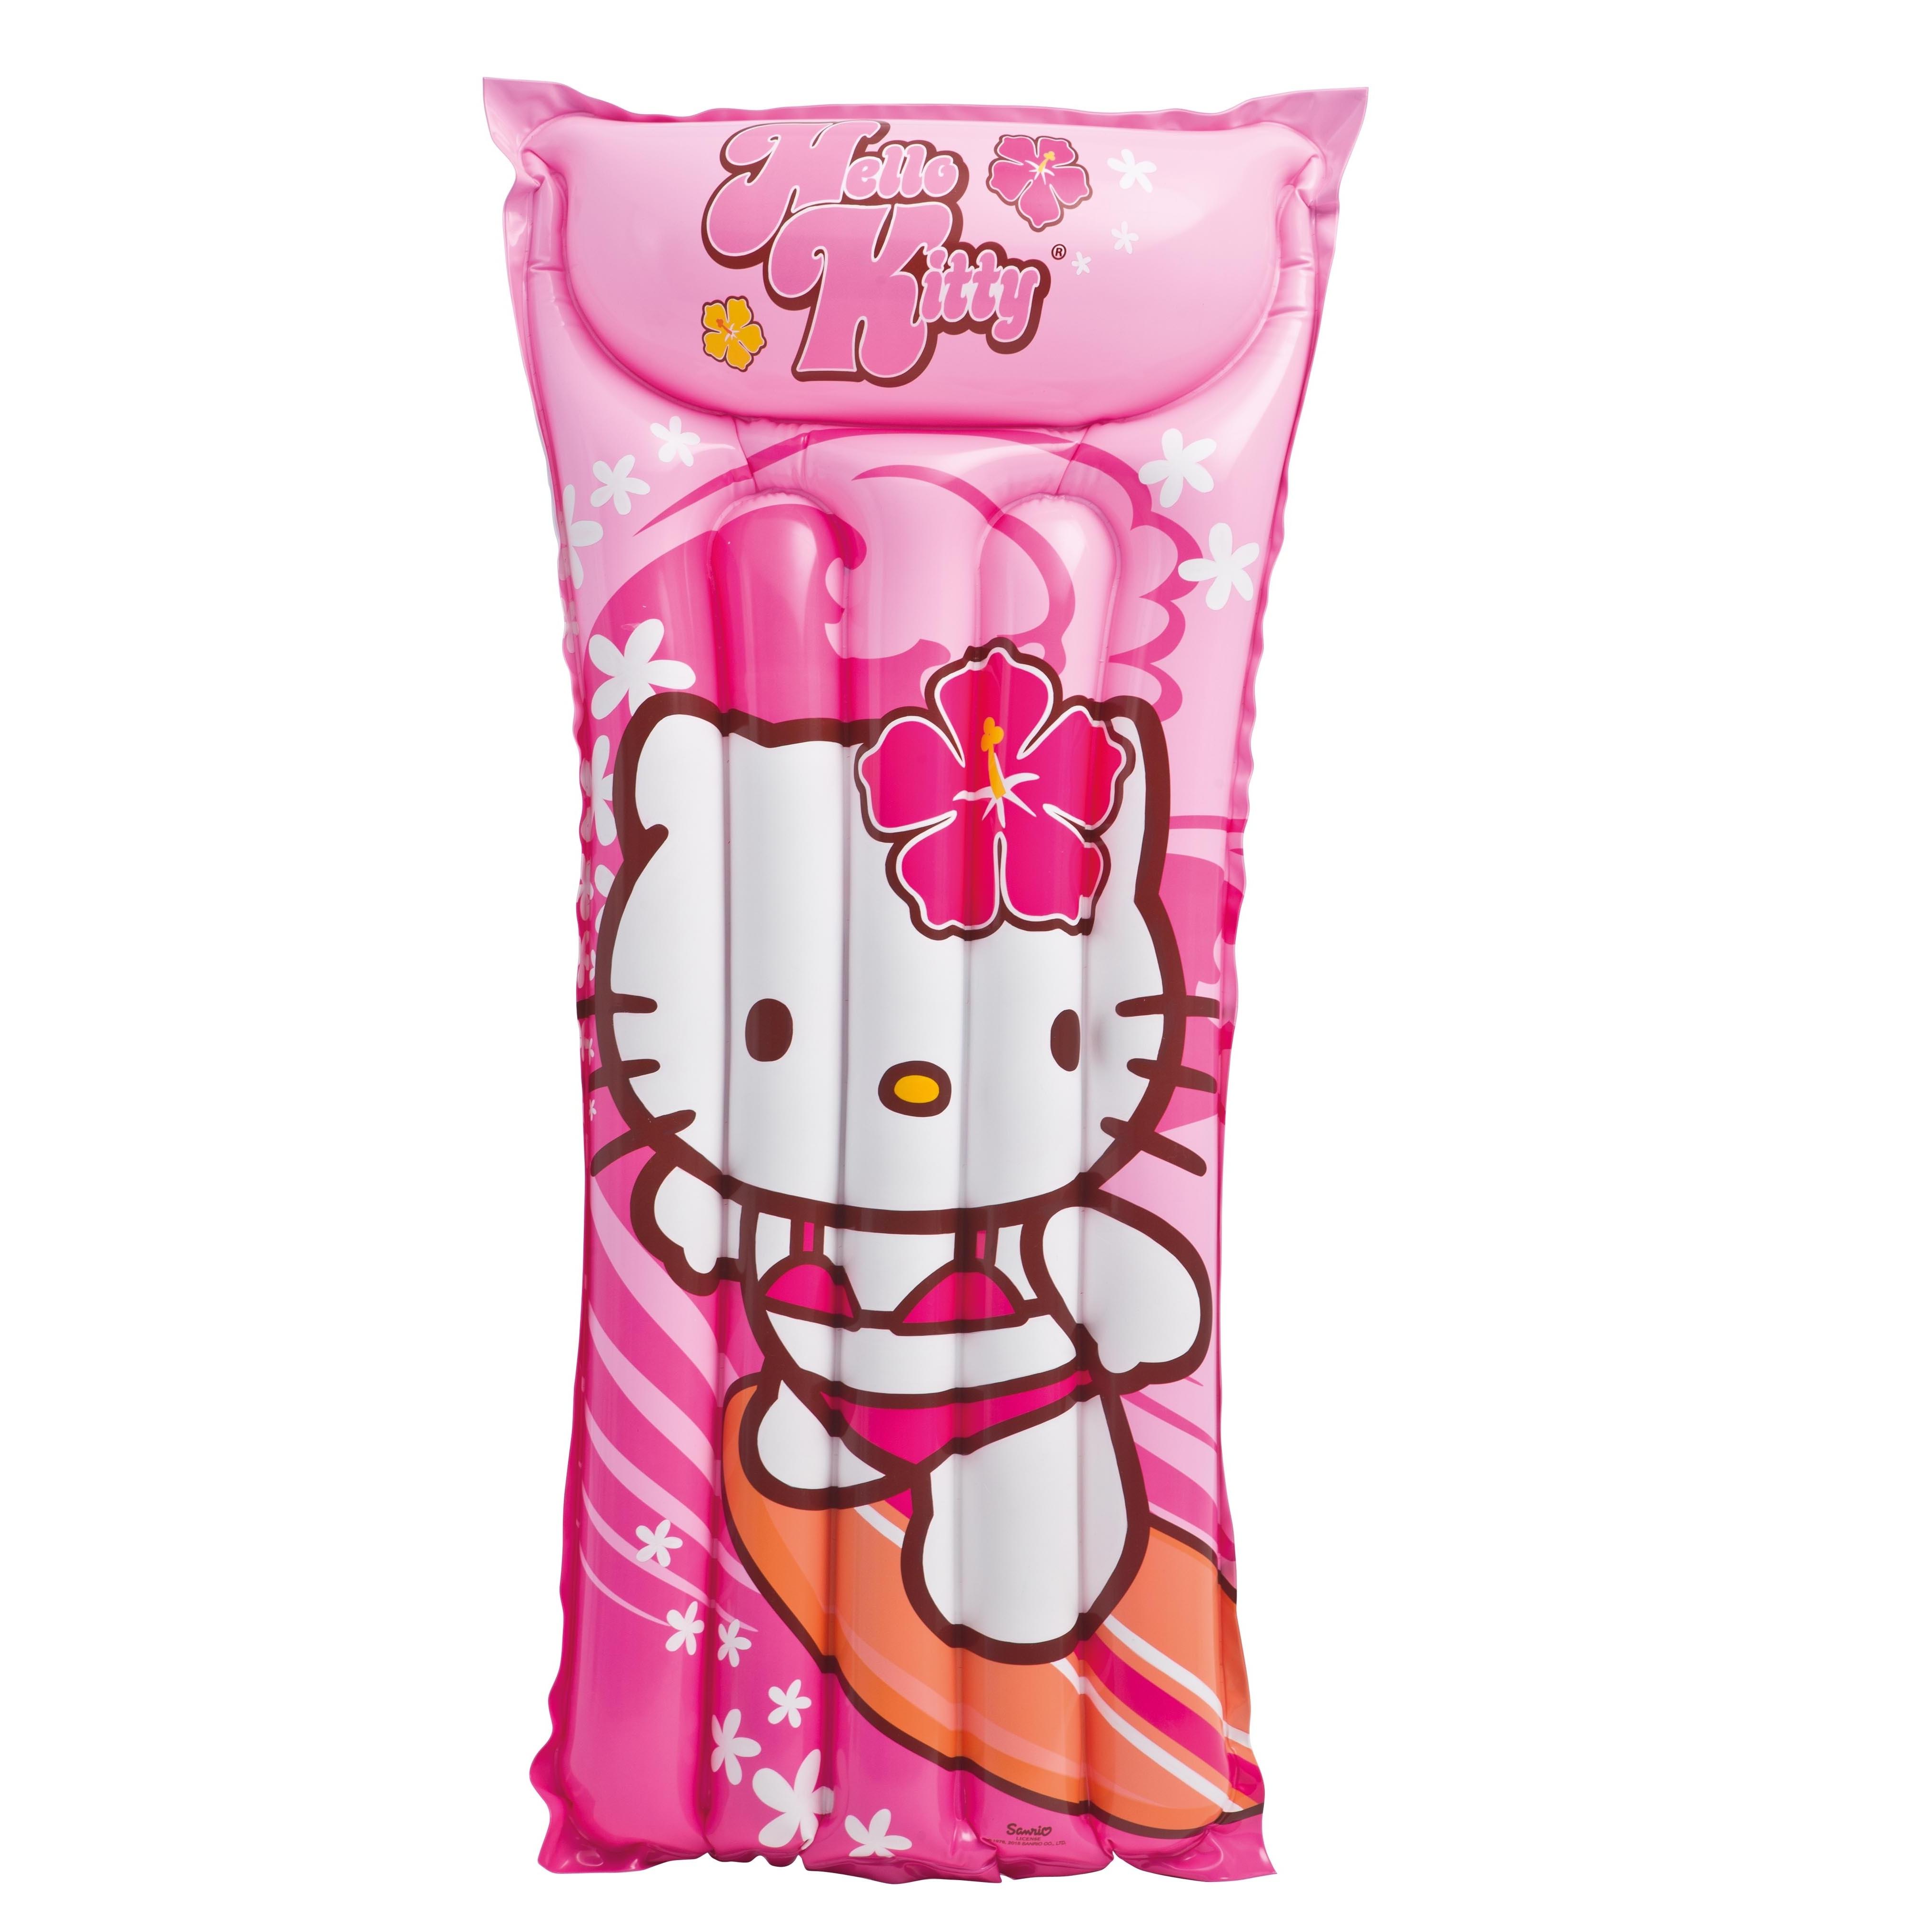 Надувной матрас Hello Kitty, 118 см